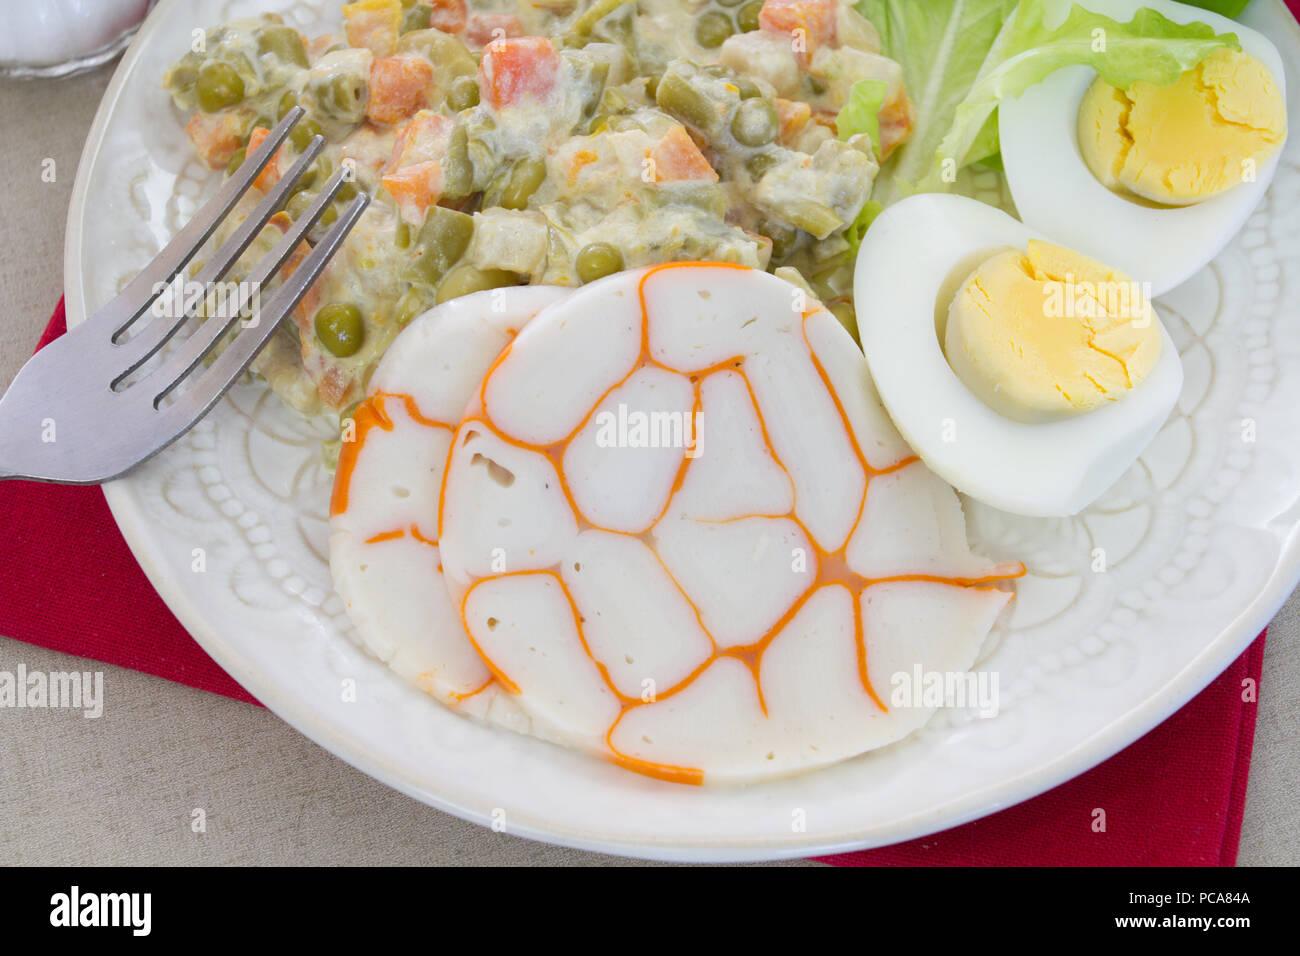 egg, vegetable macedonia and surimi - Stock Image